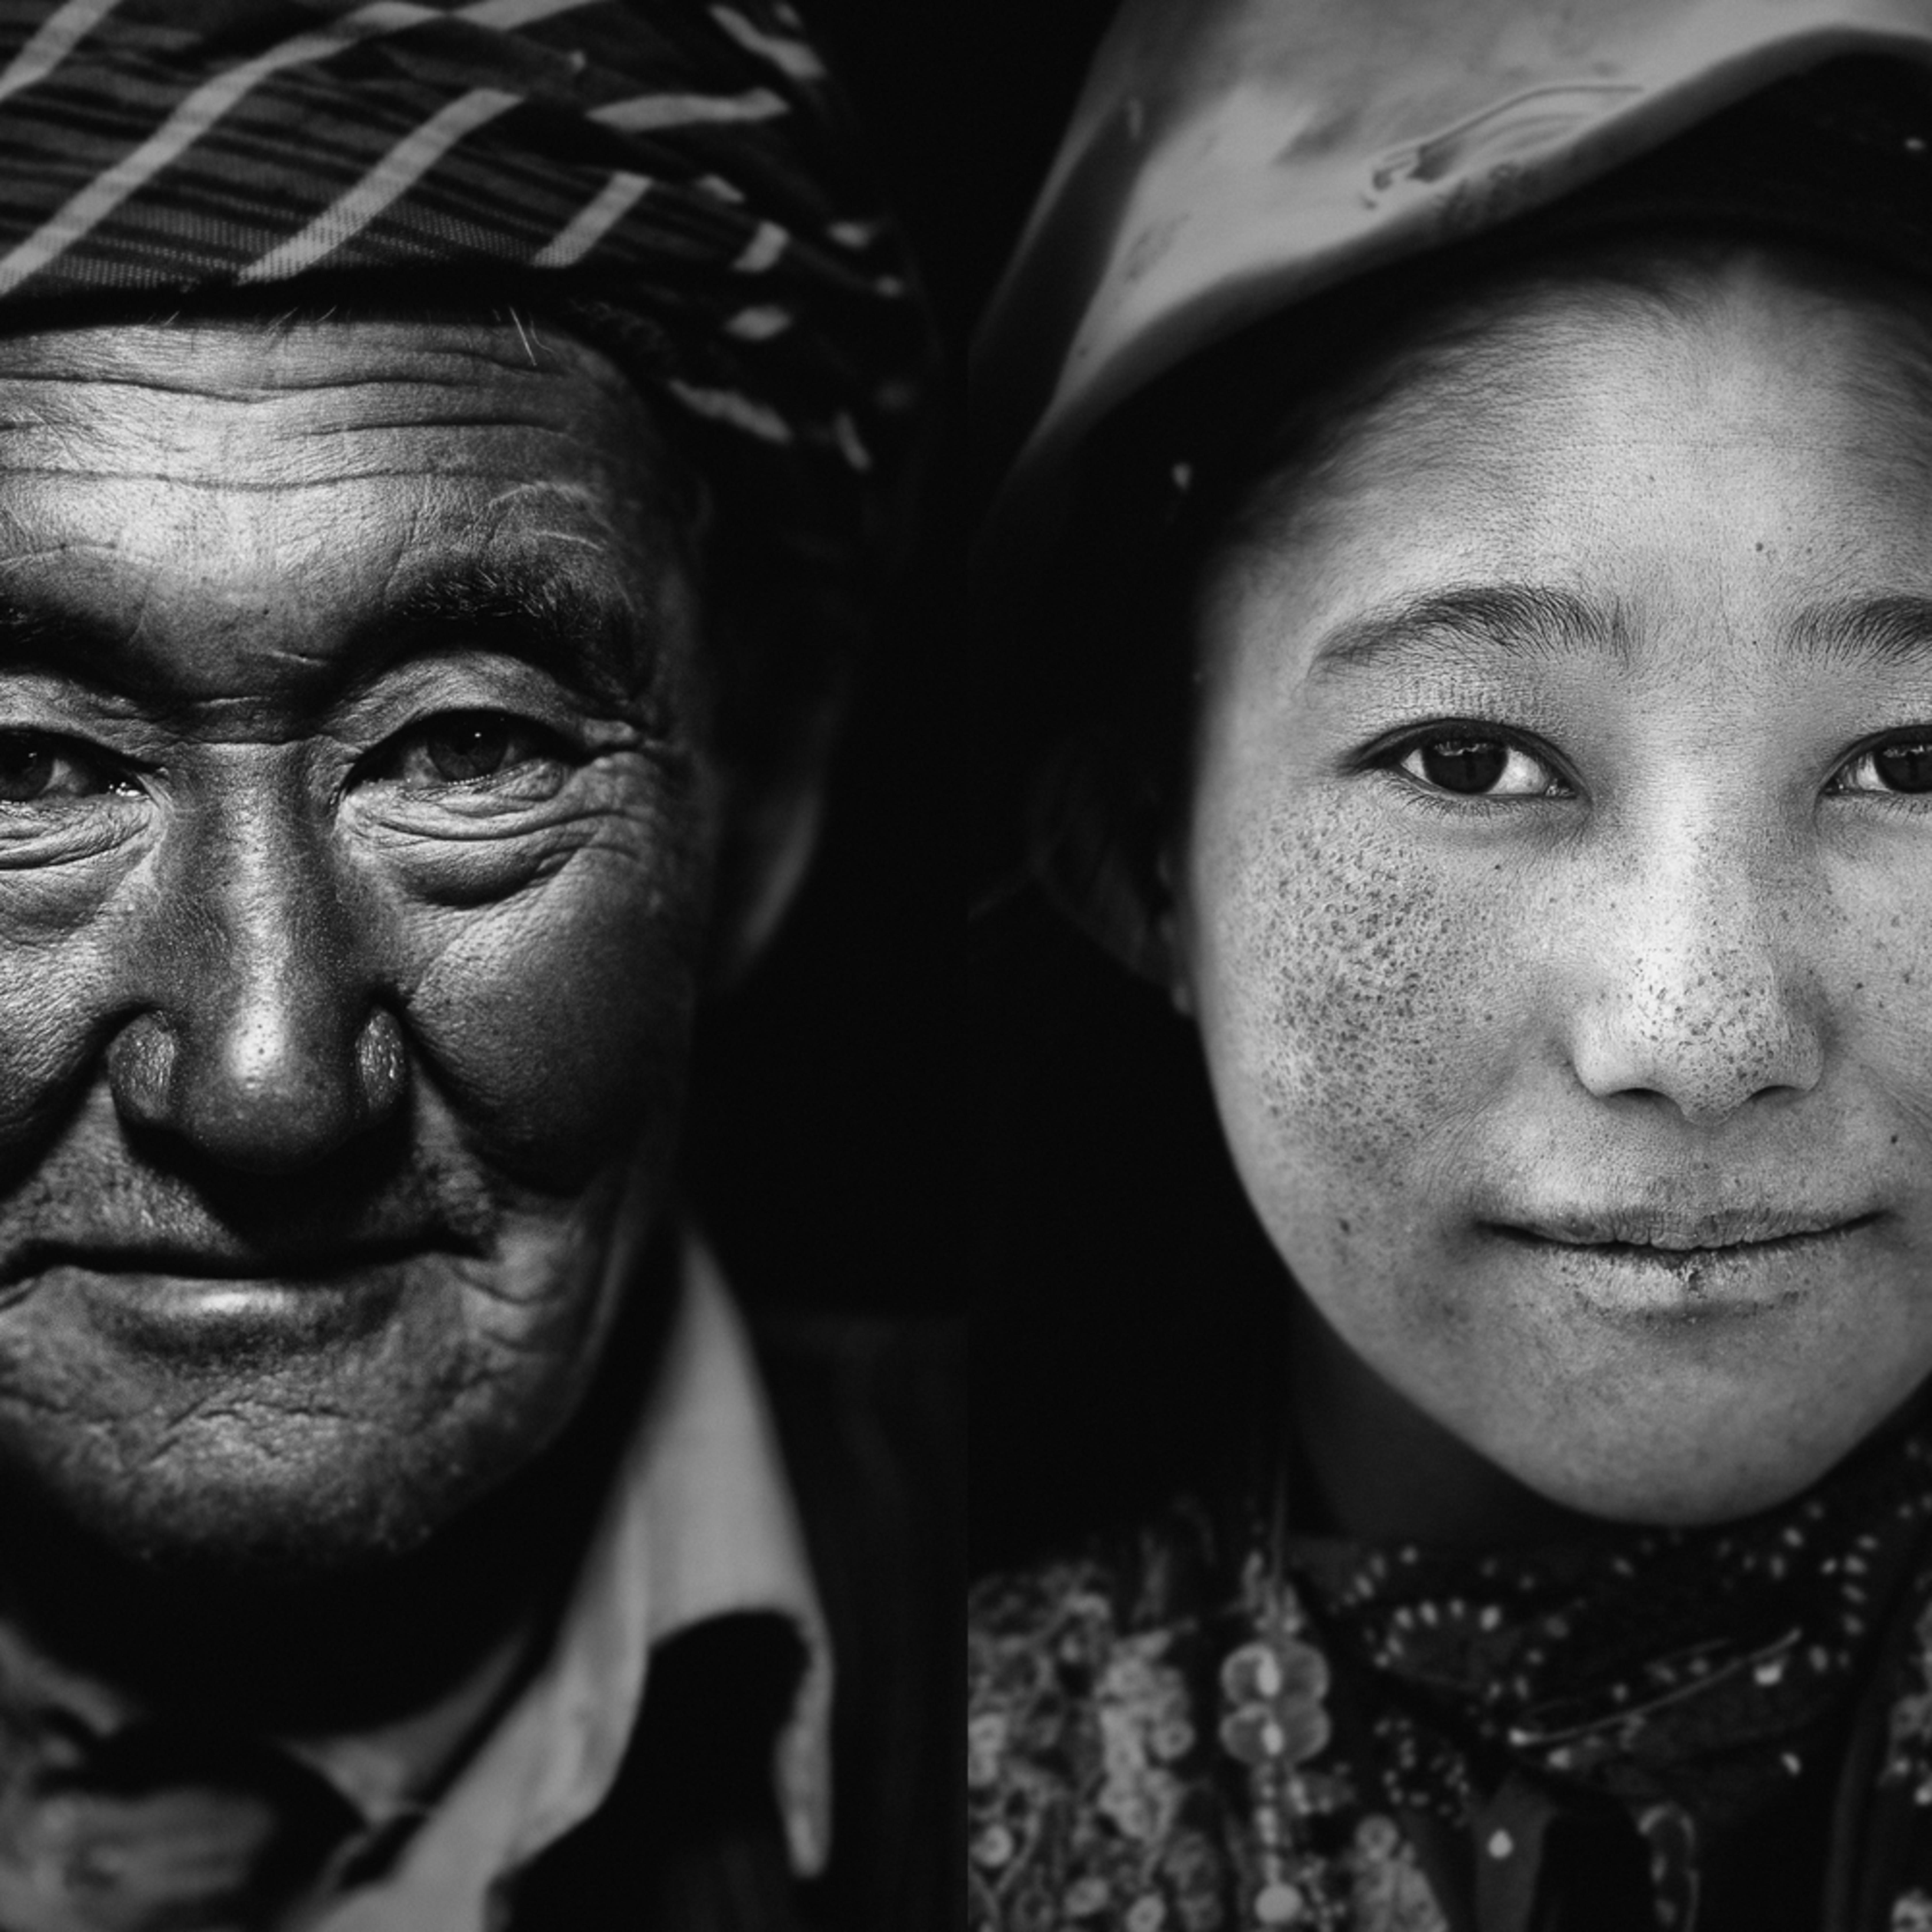 Kyrgyz souls oabjxf